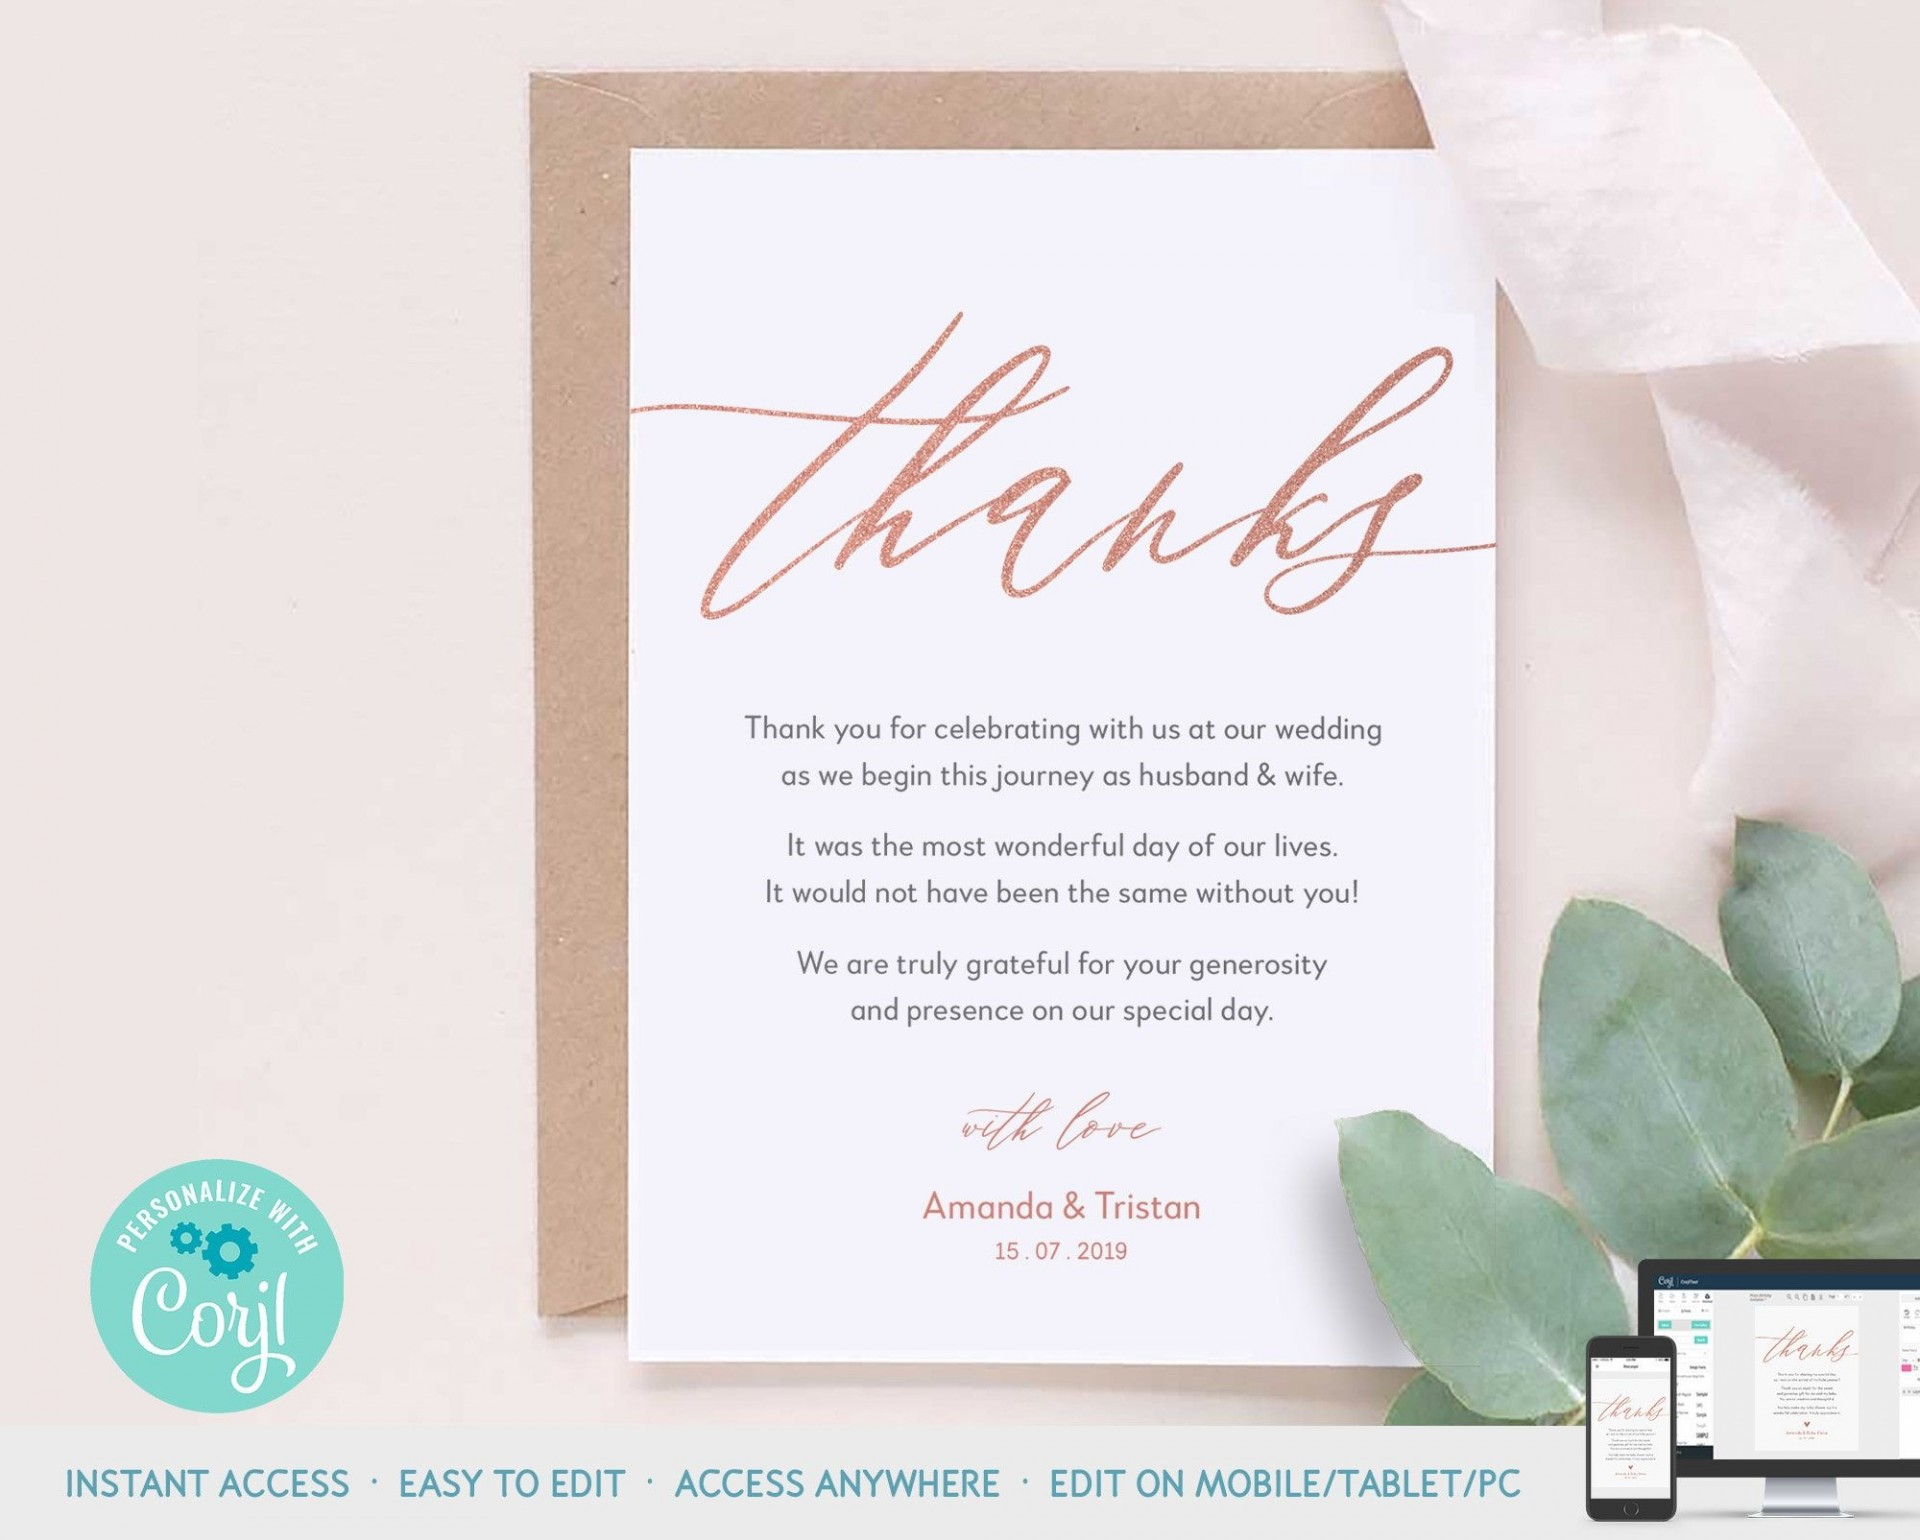 003 Best Bridal Shower Card Template Picture  Invitation Free Download Bingo1920